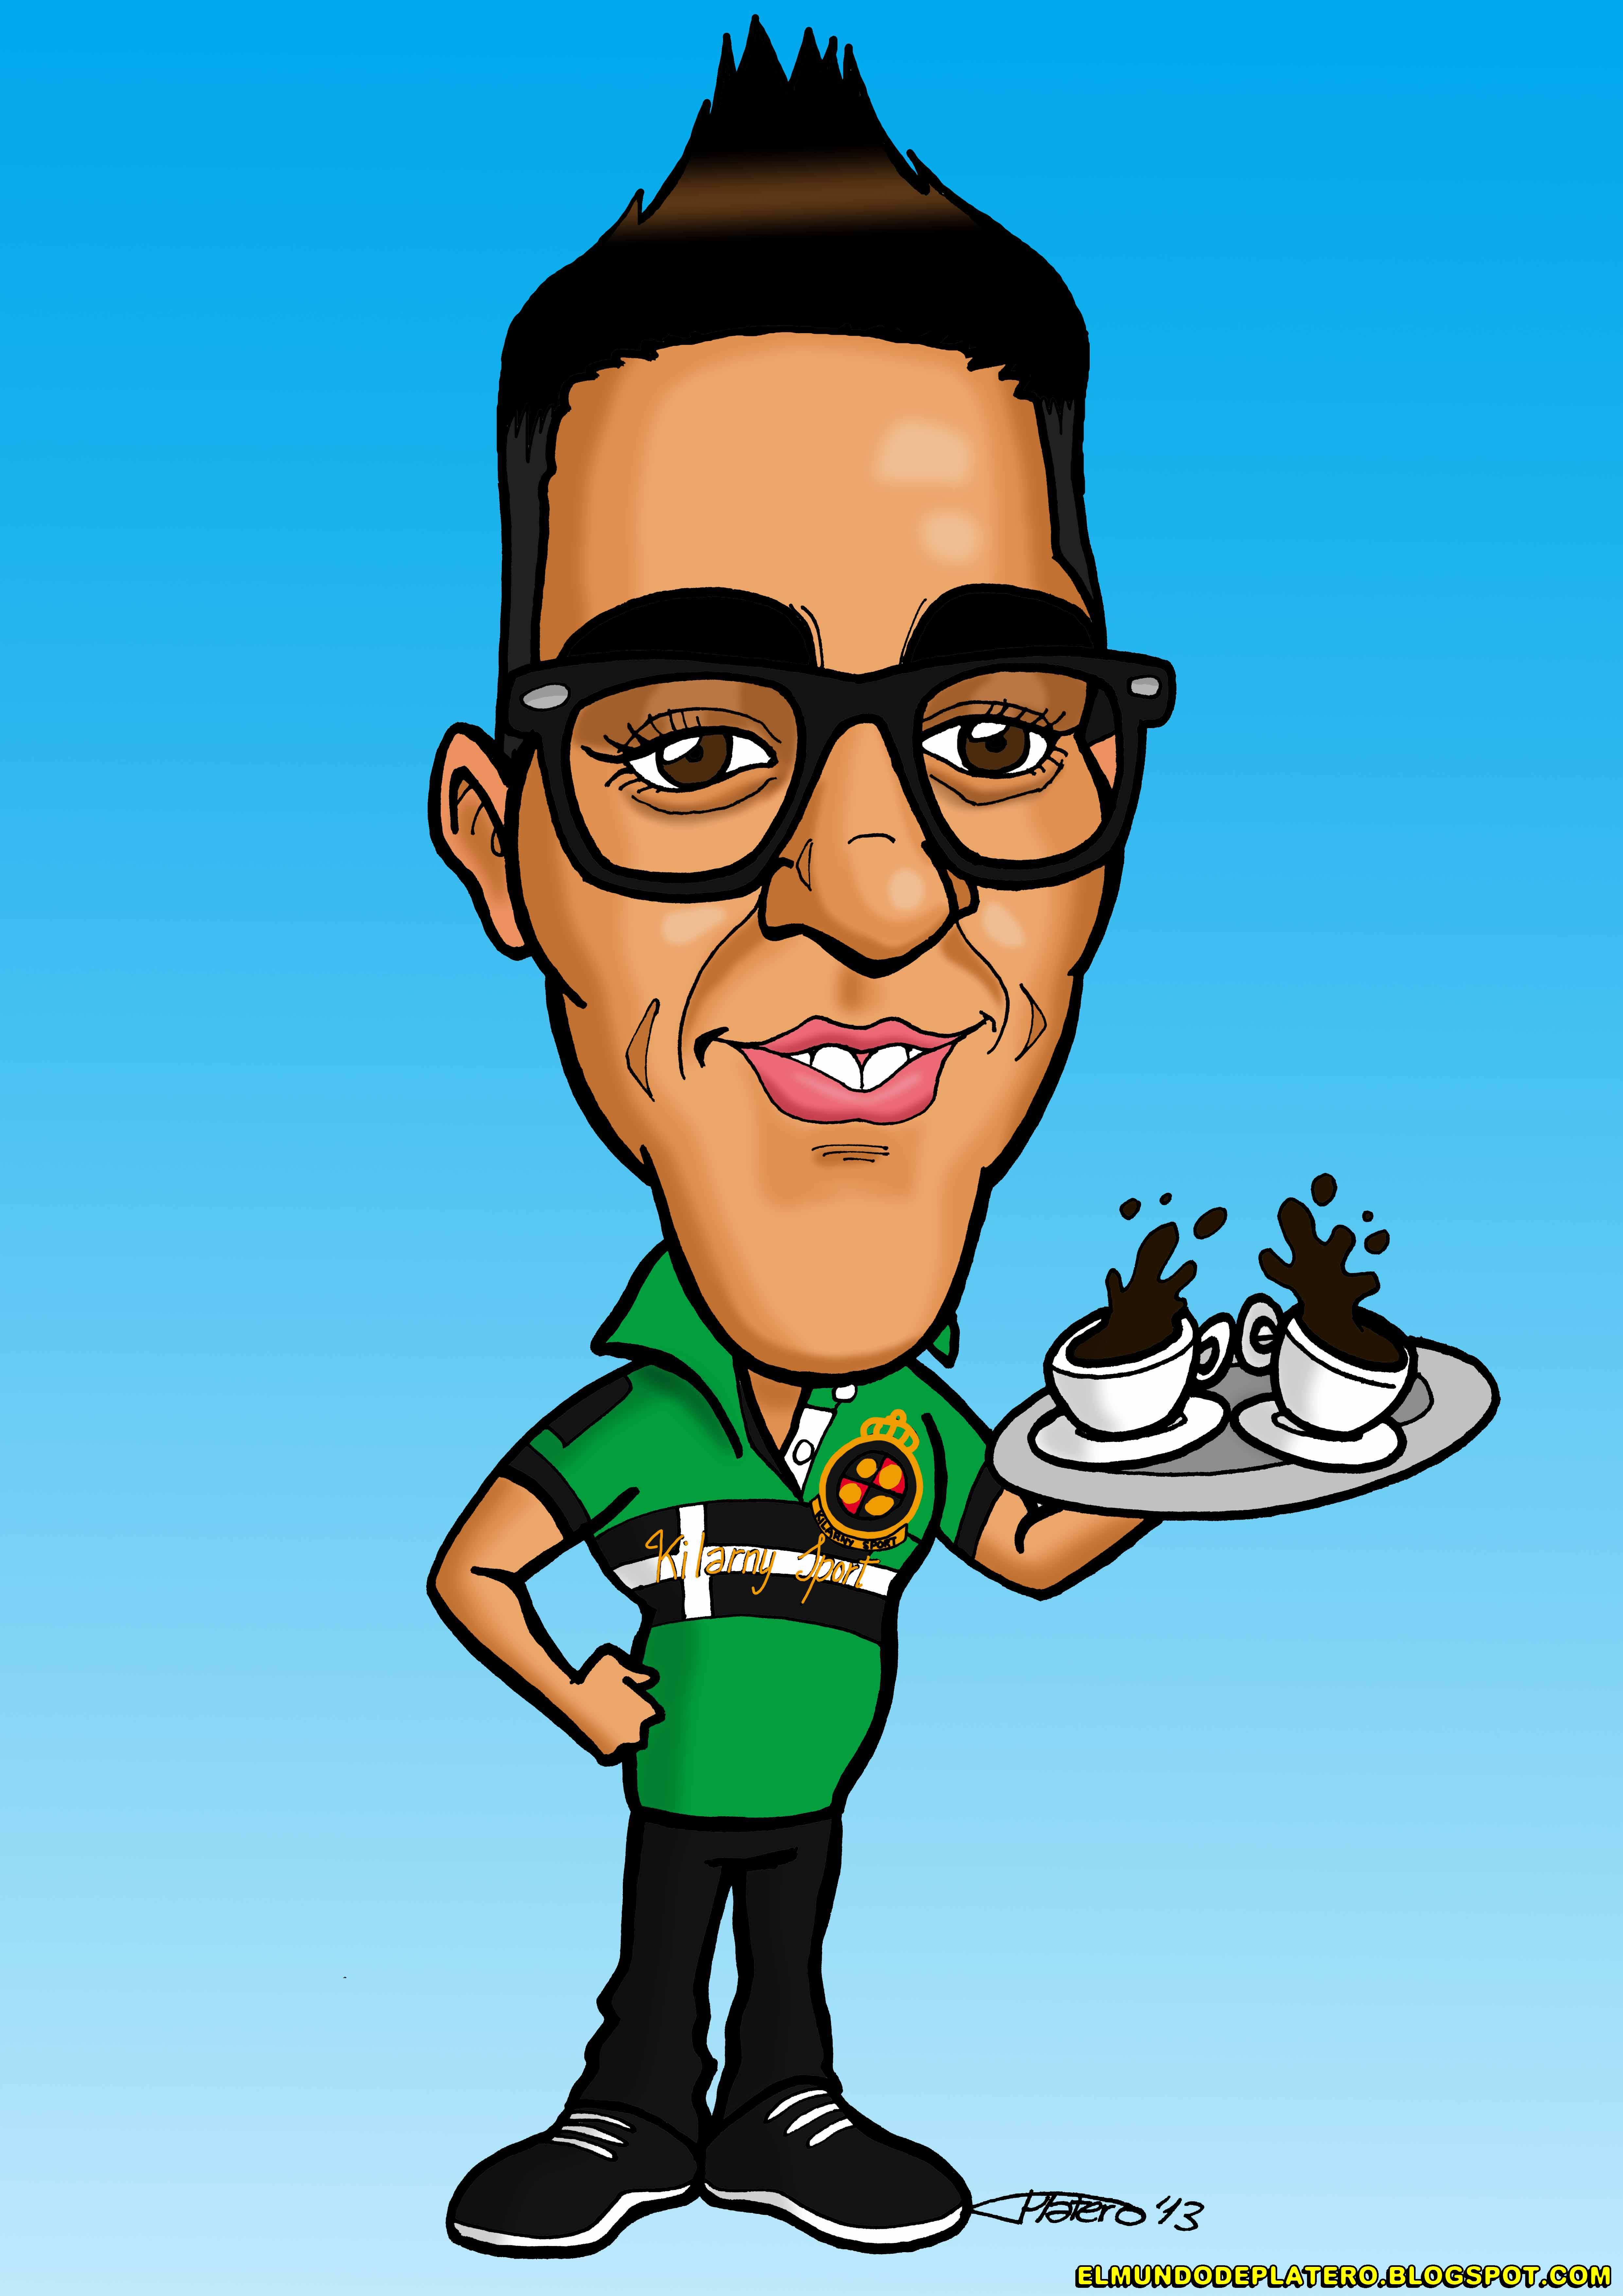 caricatura a color personalizada por encargo_nolo vázquez_elmundodeplatero_josé